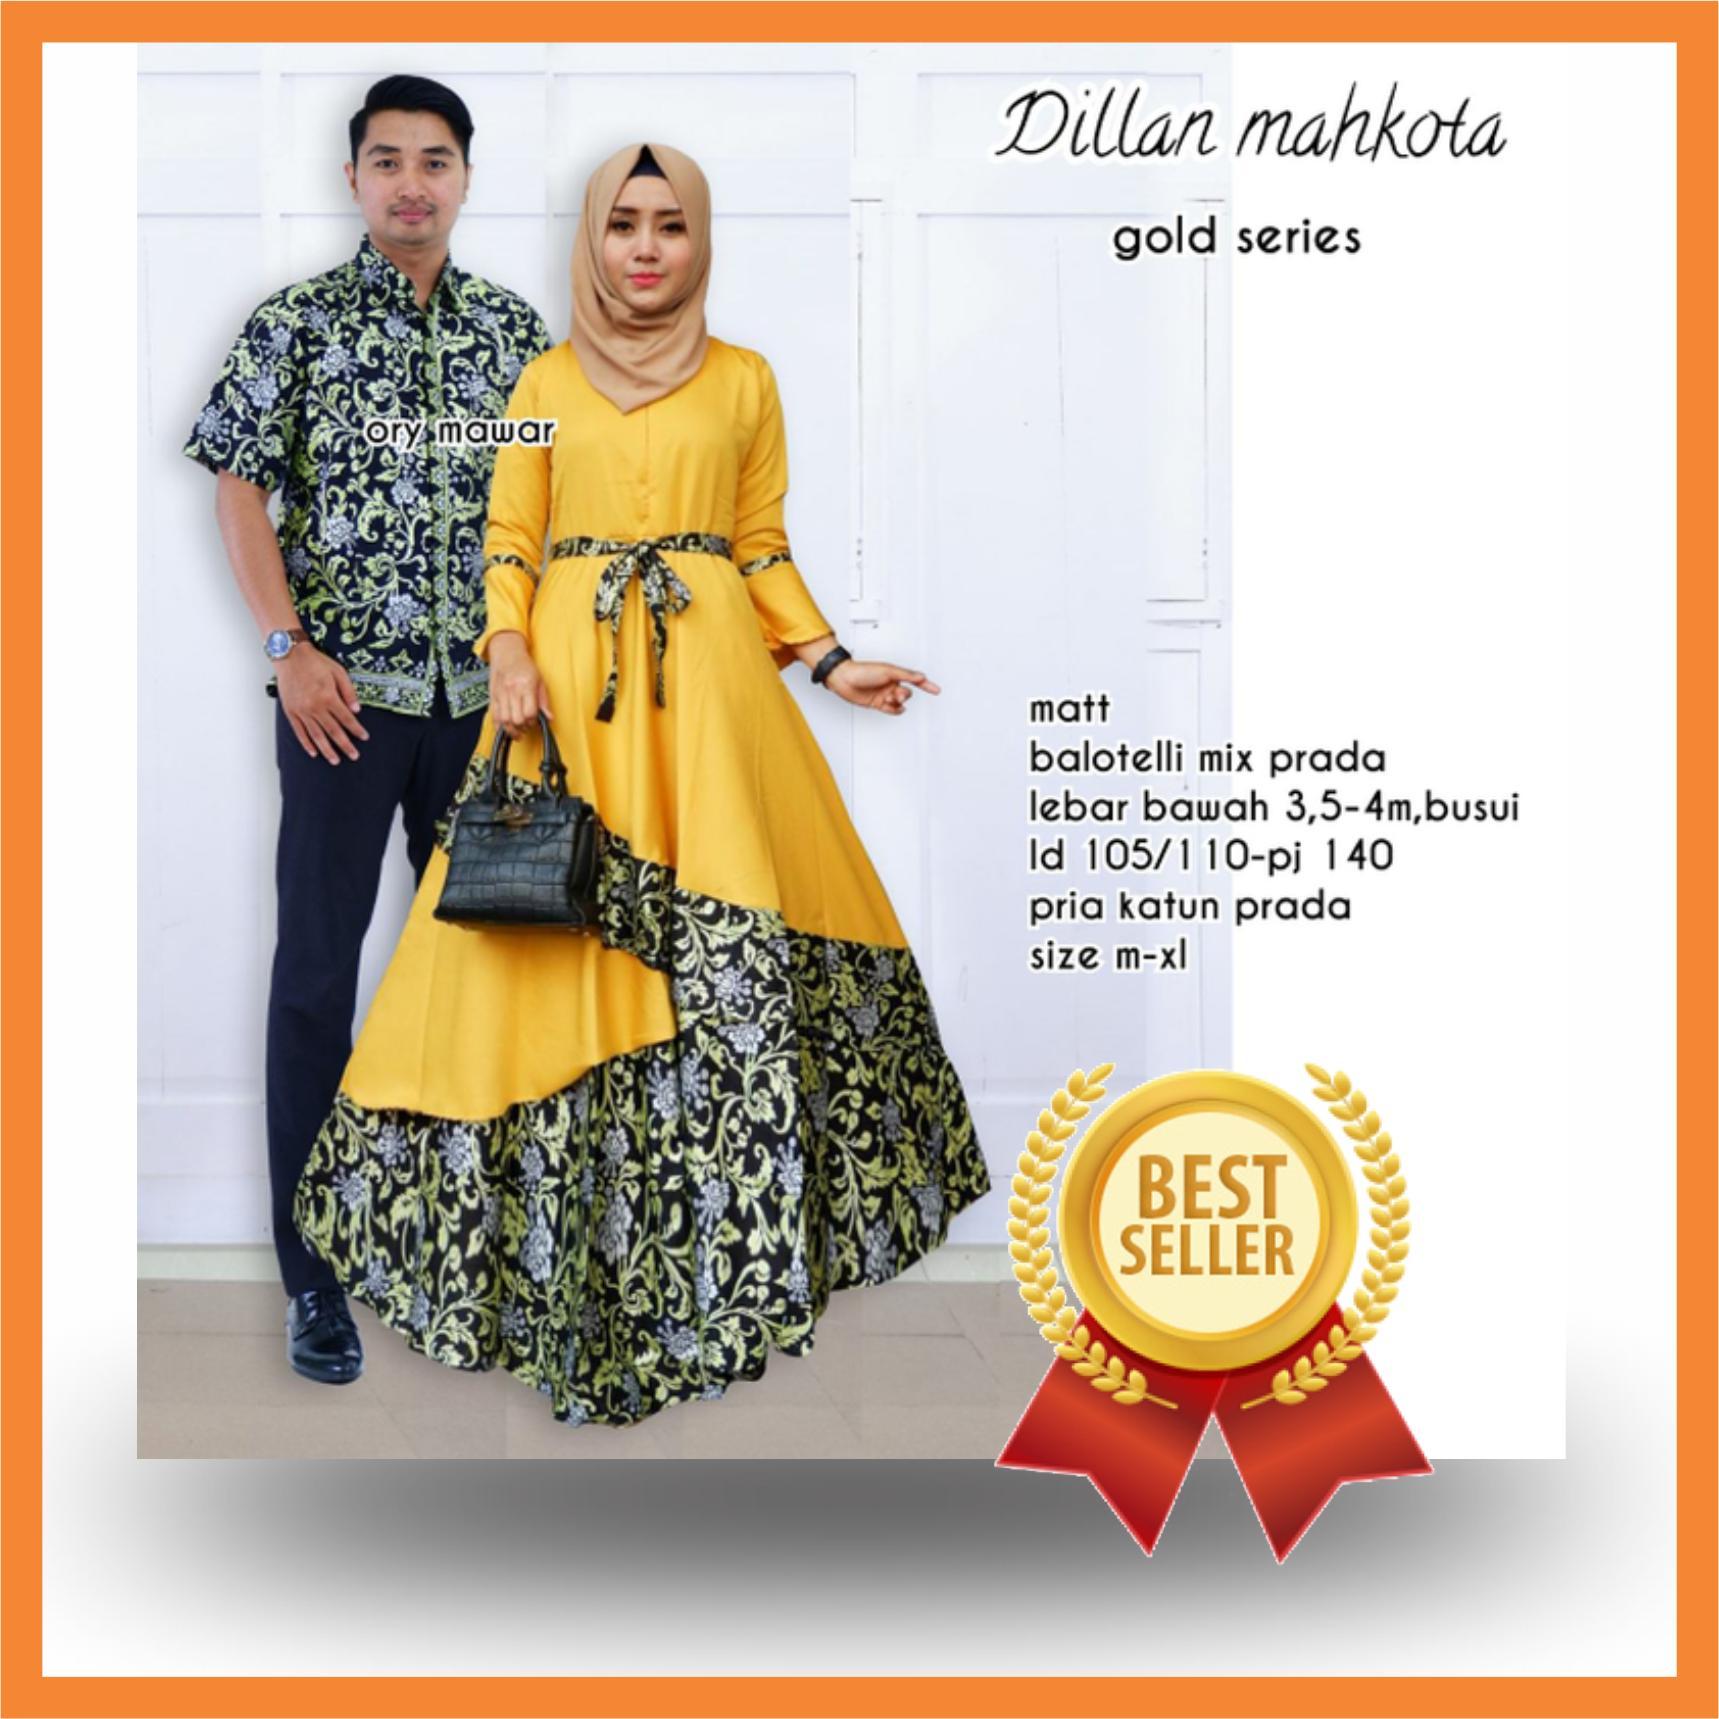 Cek Harga Baru Baju Muslim Couple Batik Sabrina Seragam Pesta Hijab Modern Sarimbit Kemeja